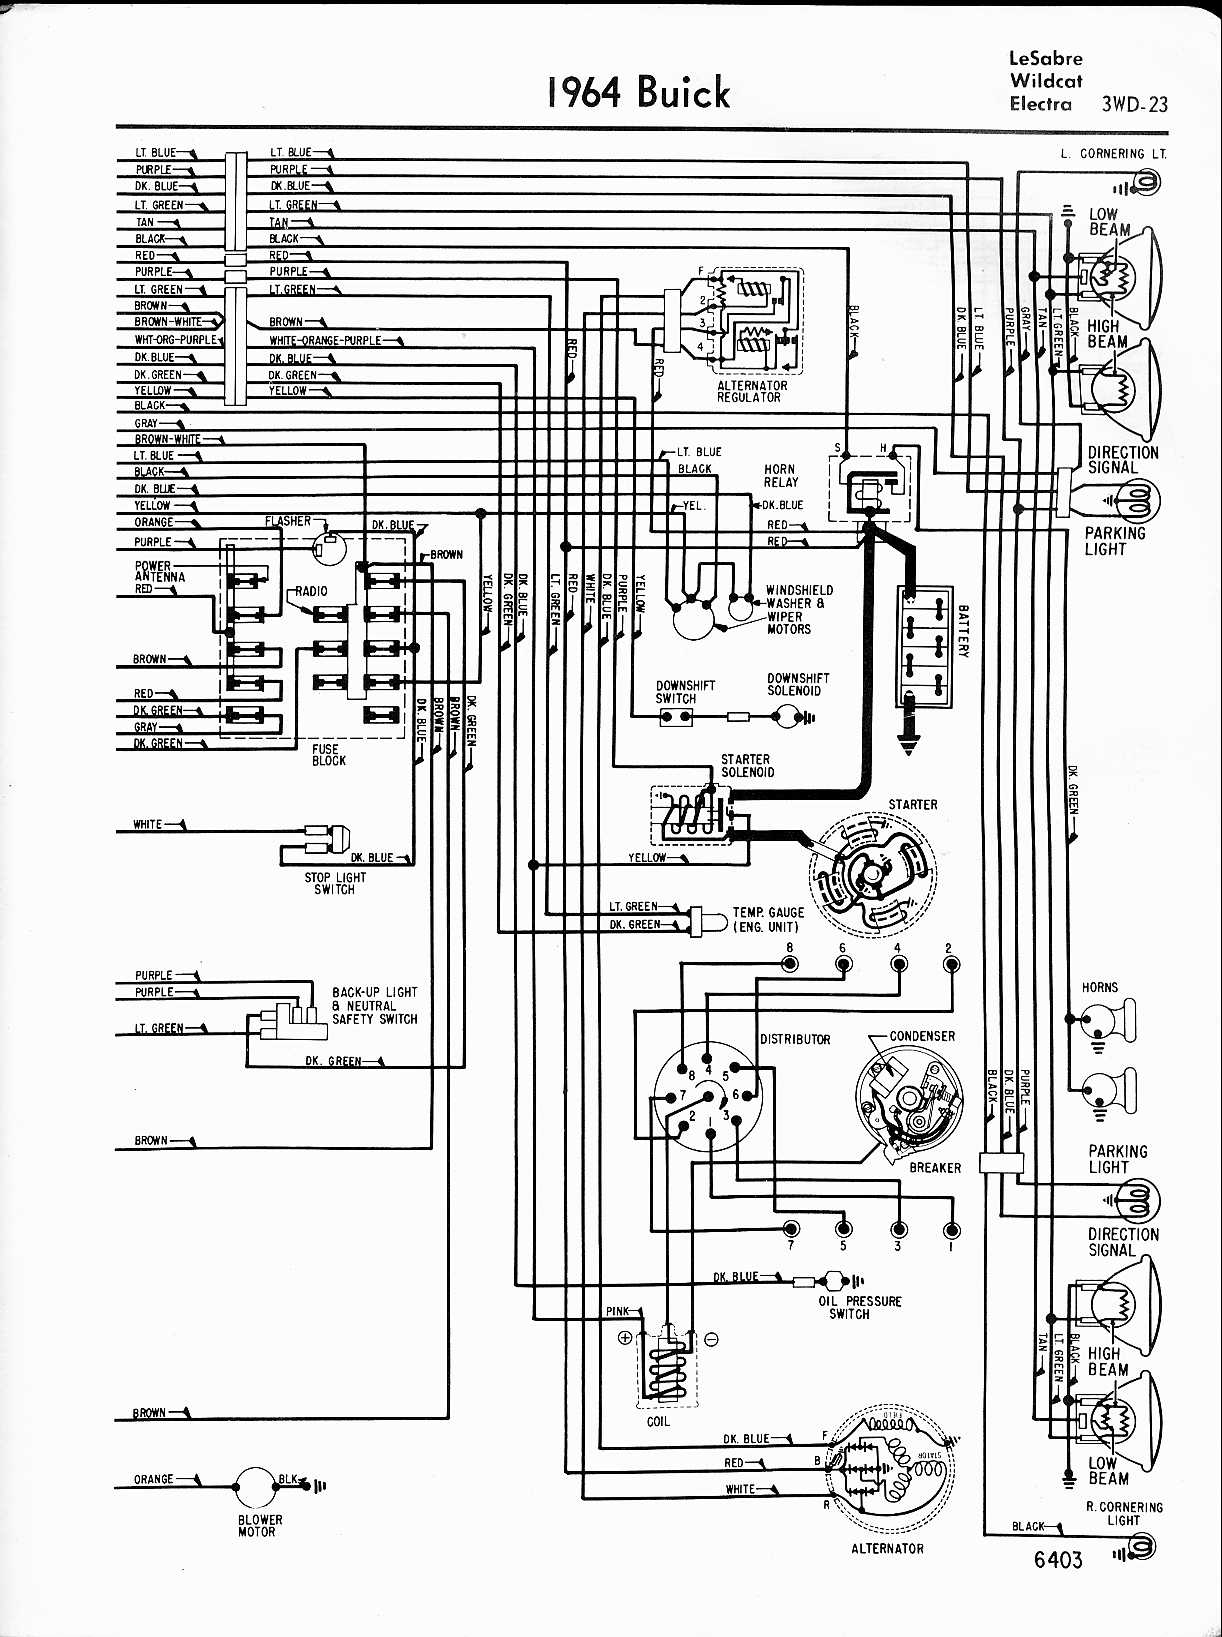 Honda Ca77 Wiring Diagram Honda Tl125 Wiring Diagram Wiring Diagram ~ ODICIS